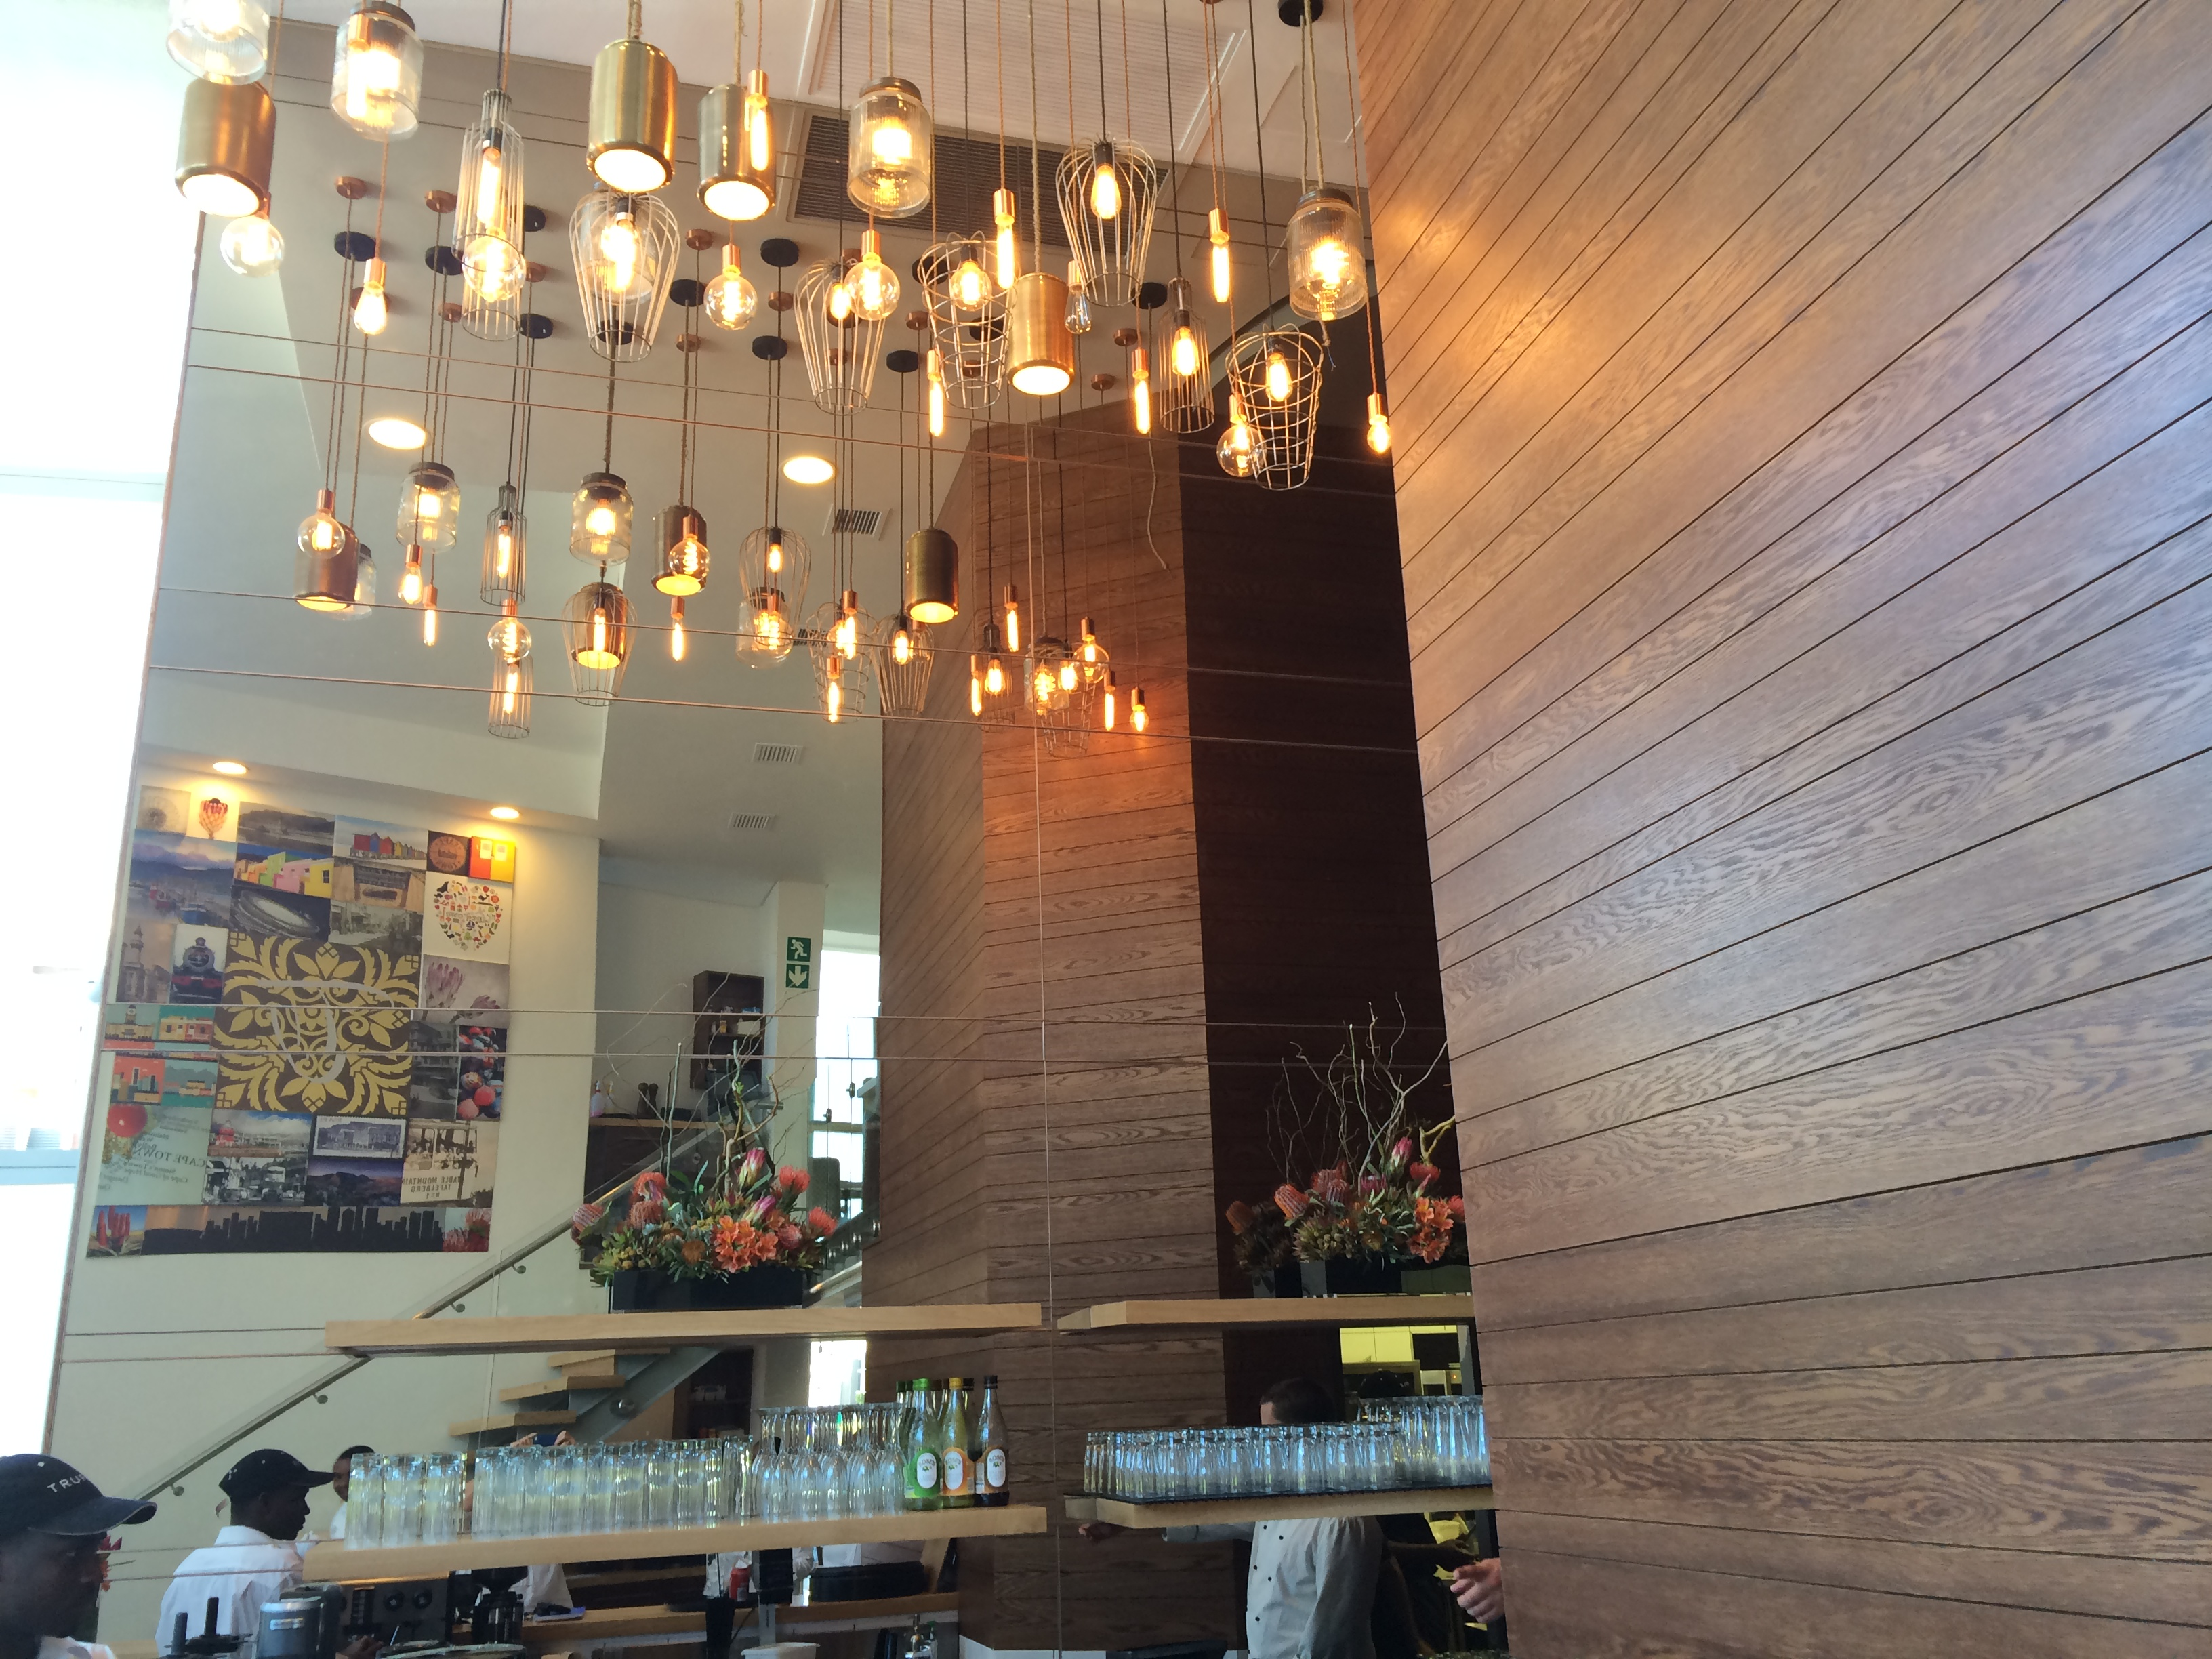 Fine Dining Restaurant Kitchen Layout restaurant review: truffle first '5 star 100% halaal fine dining